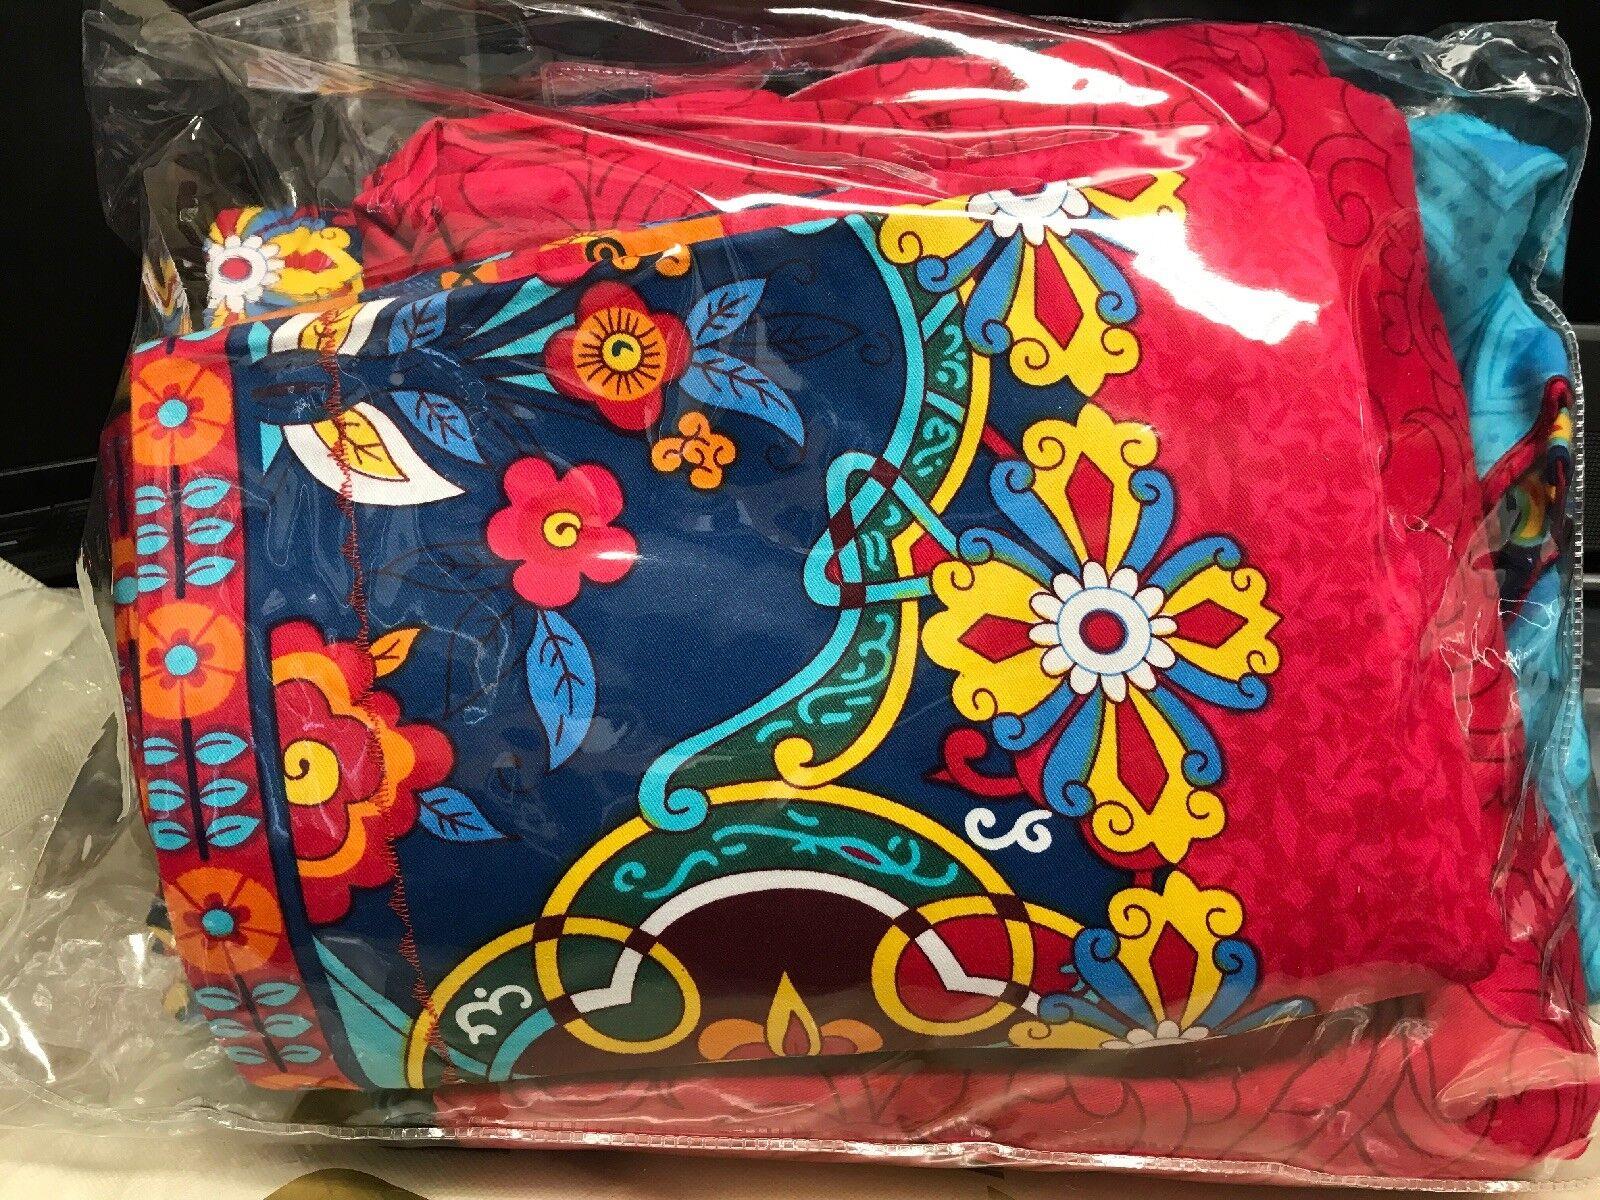 FADFAY 4 Pcs Königin Bettding Set SuperSanft Brushed Cotton Stripped Boho Style